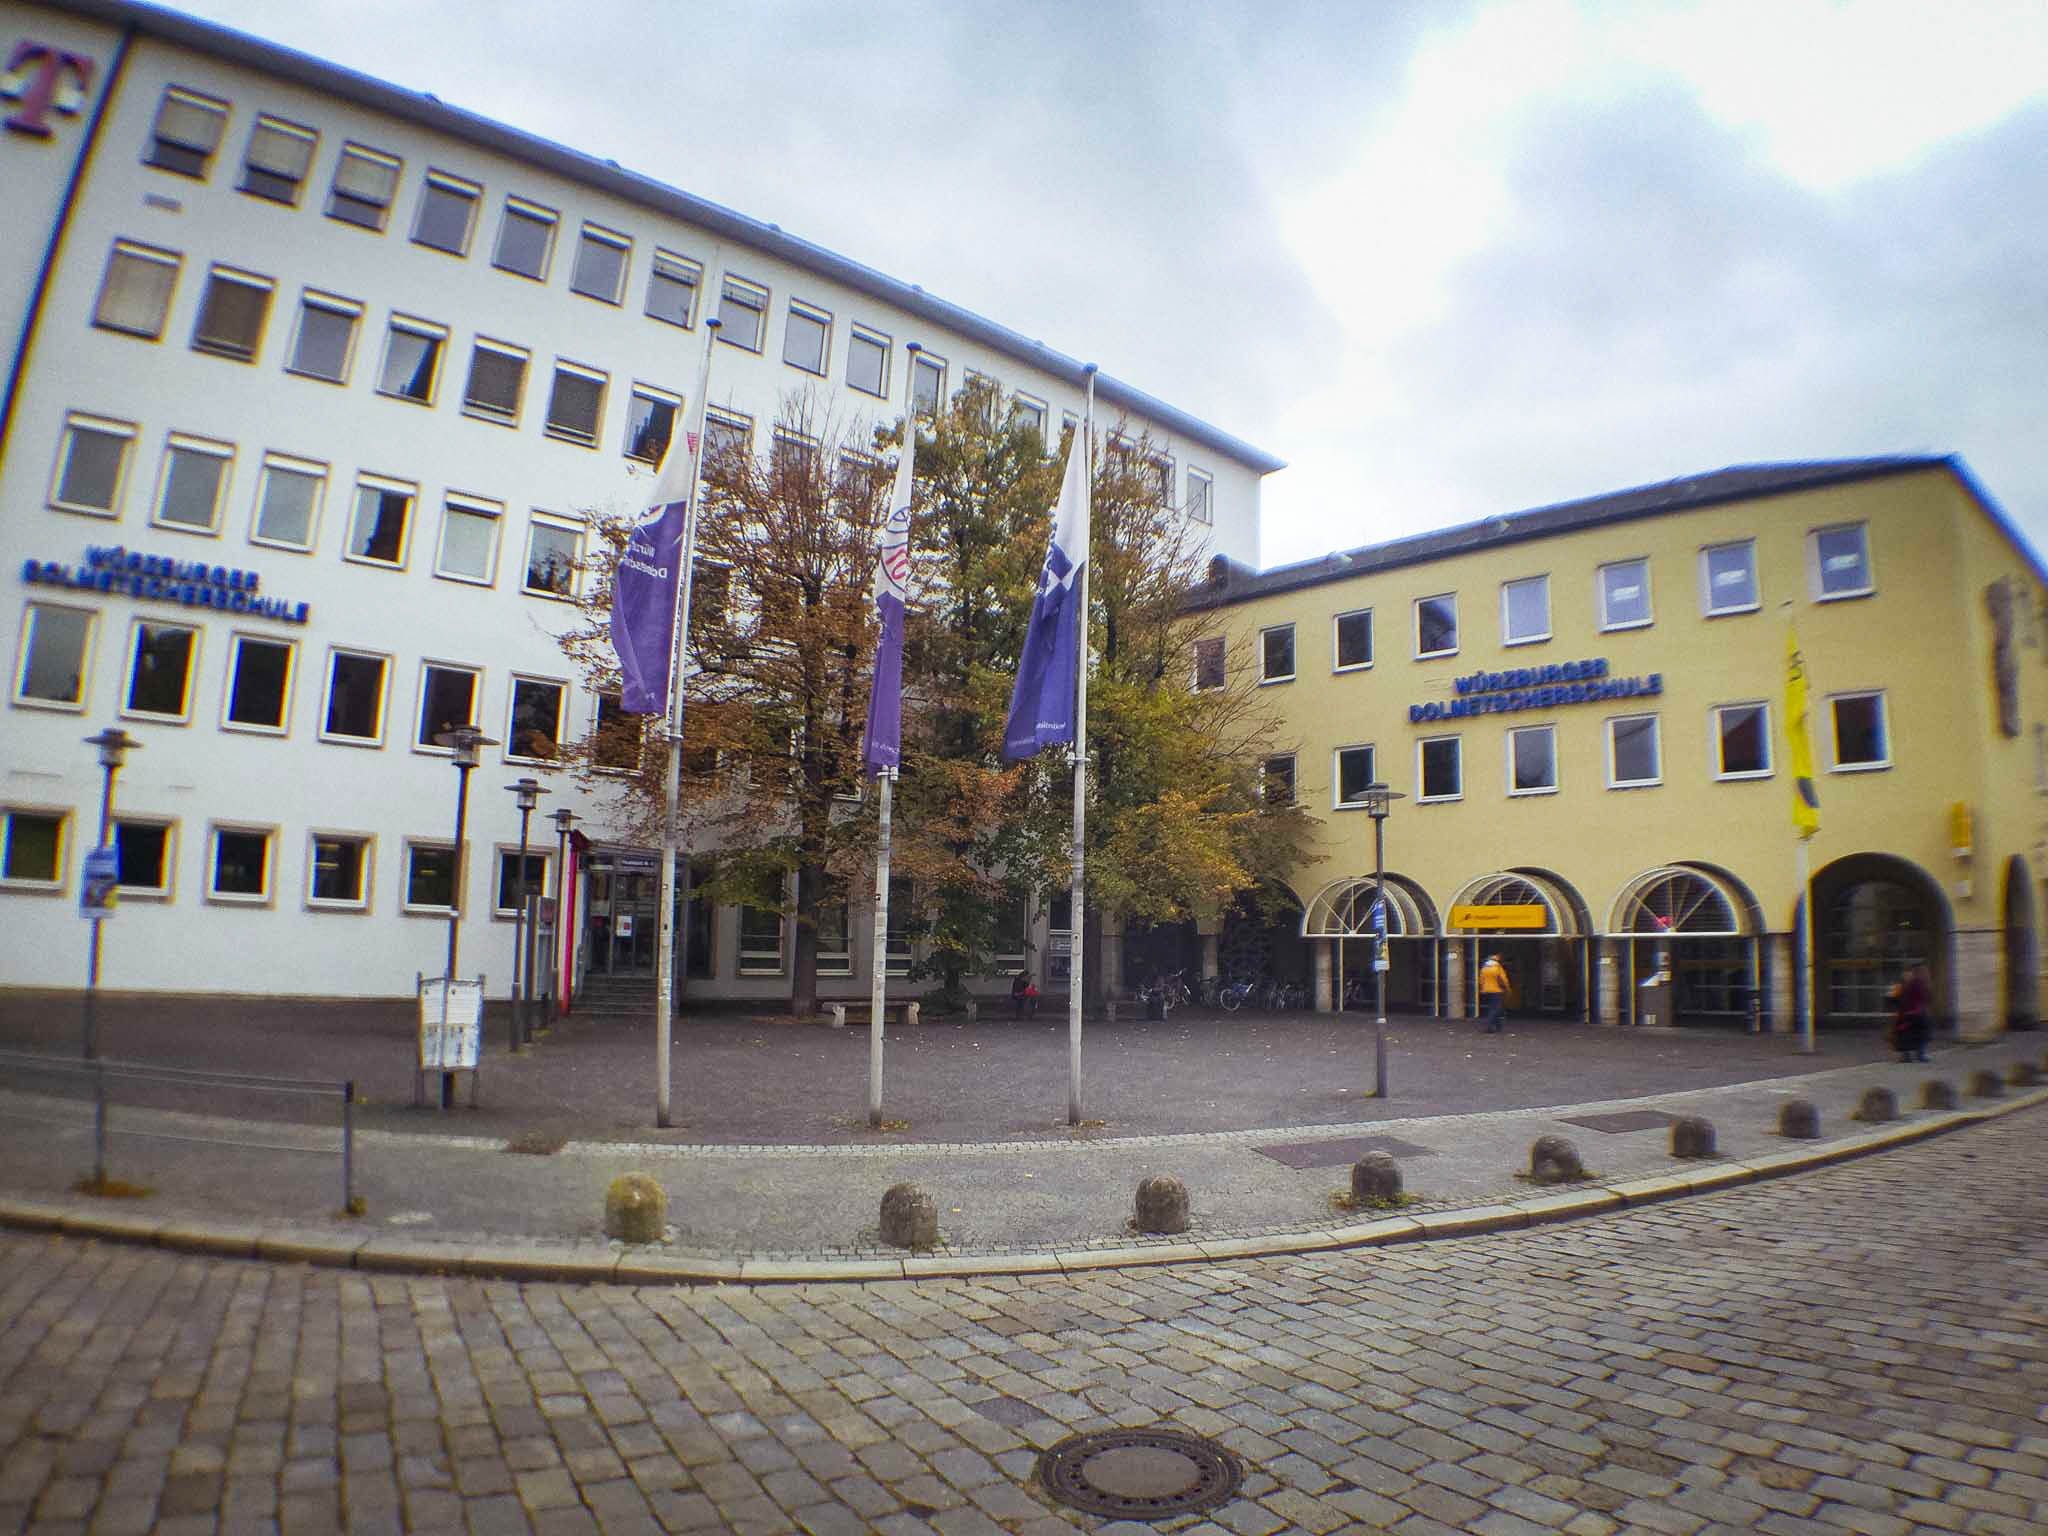 Gebäudeensemble am Paradeplatz. Foto: Dominik Ziegler